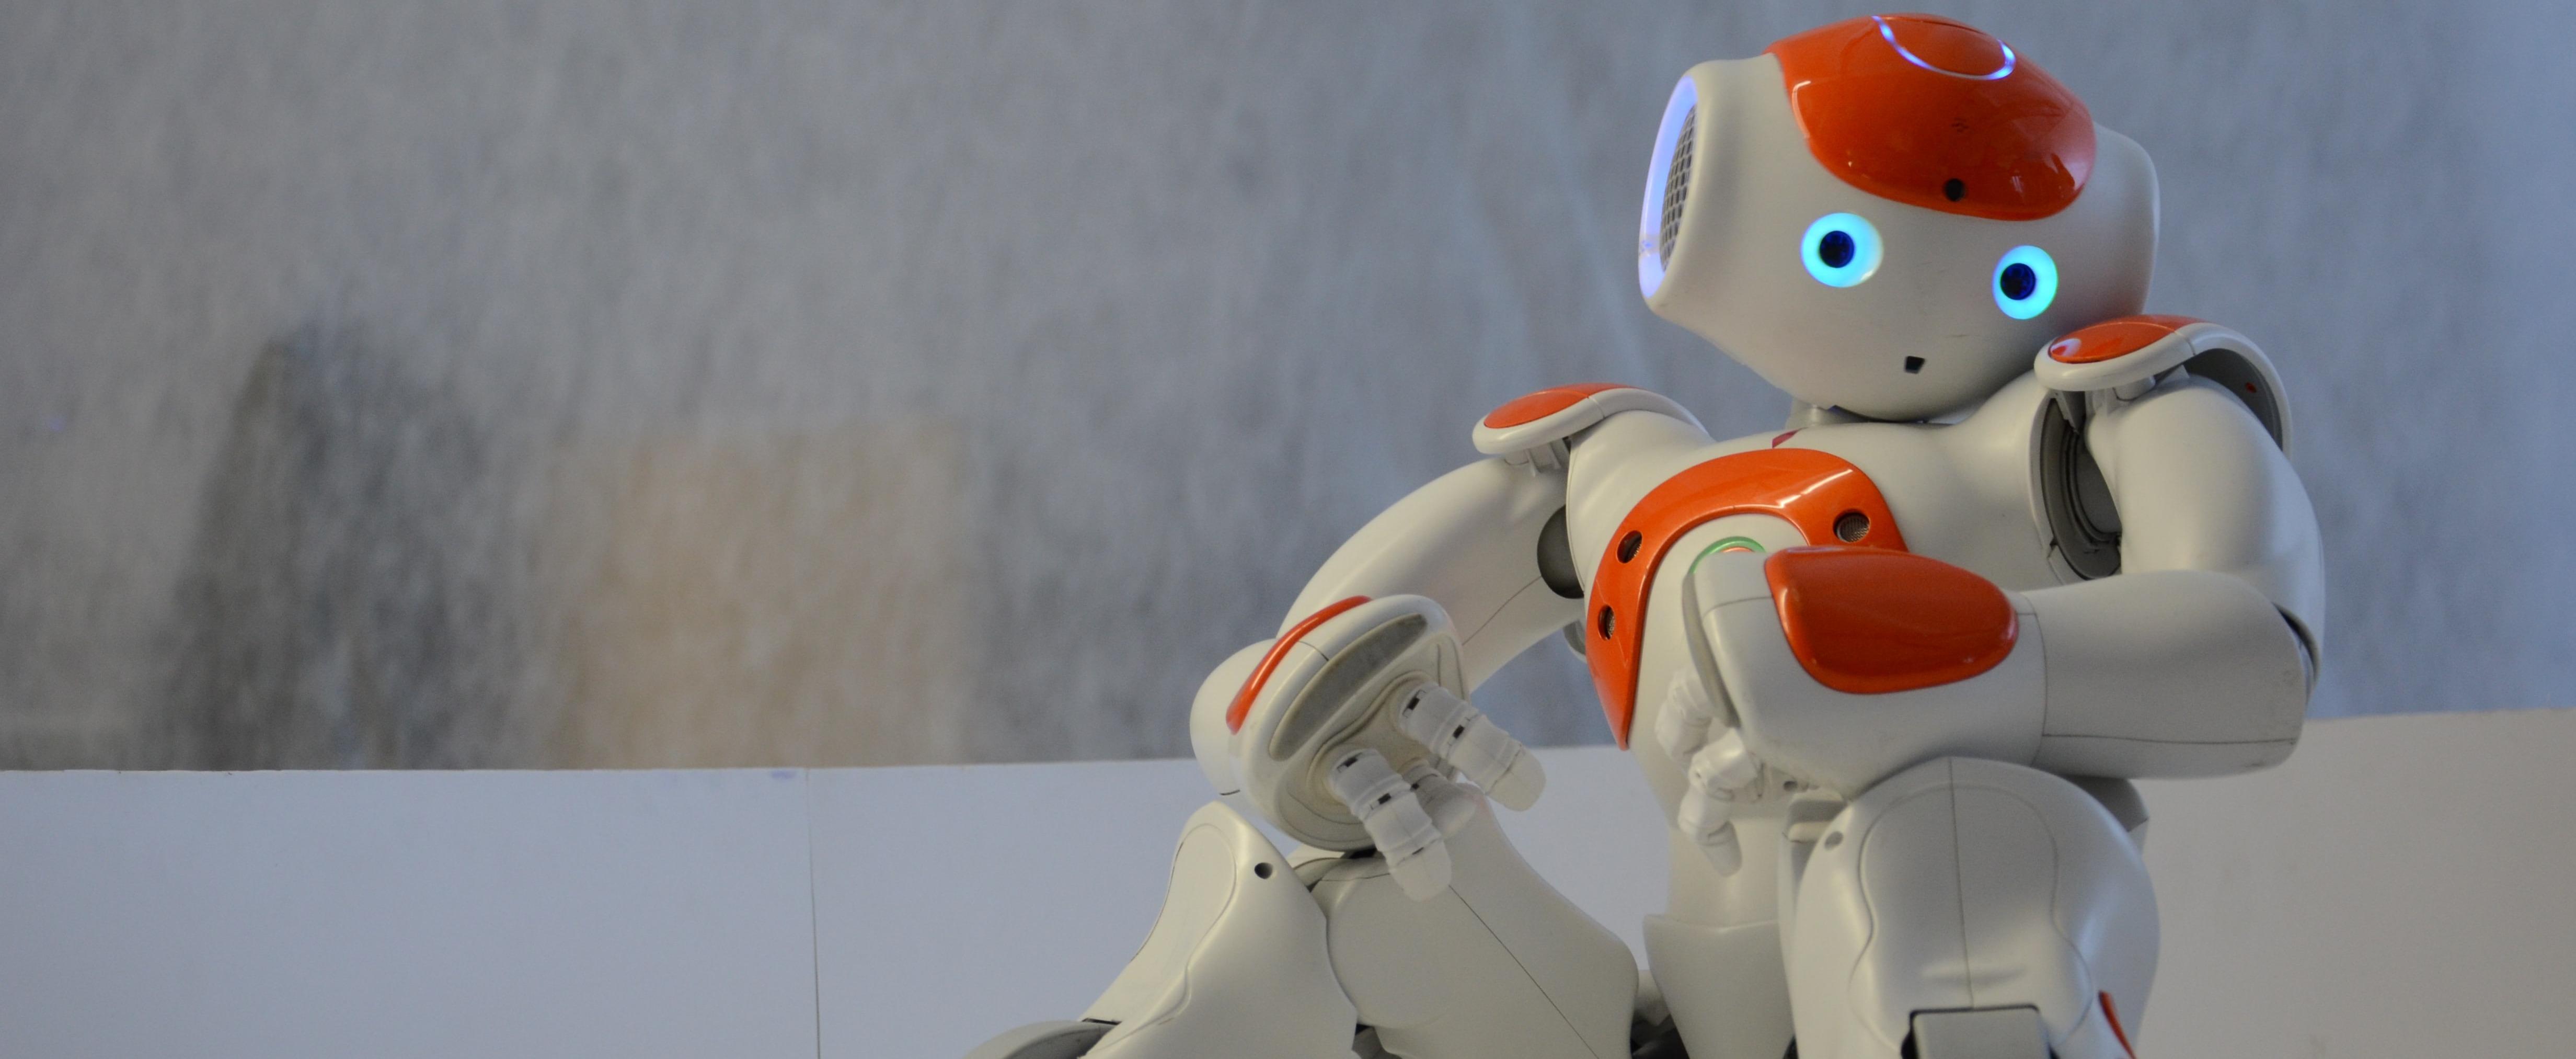 Ayanna's robot's perfect choices